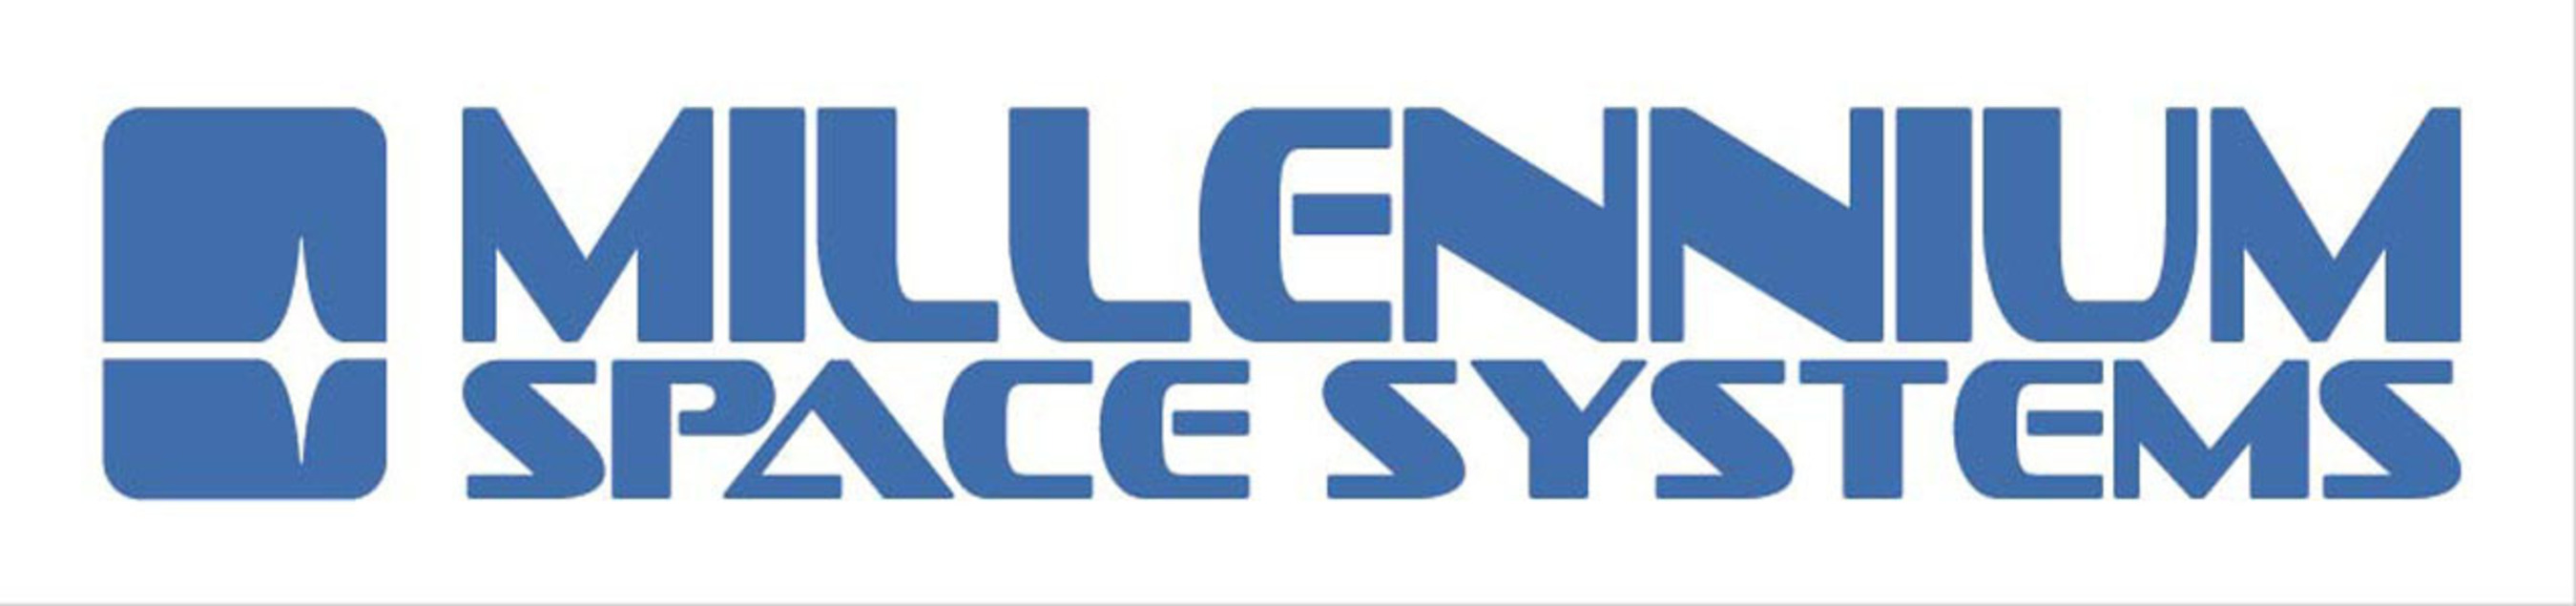 Millennium Space Systems Logo. (PRNewsFoto/Millennium Space Systems) (PRNewsFoto/MILLENNIUM SPACE SYSTEMS)